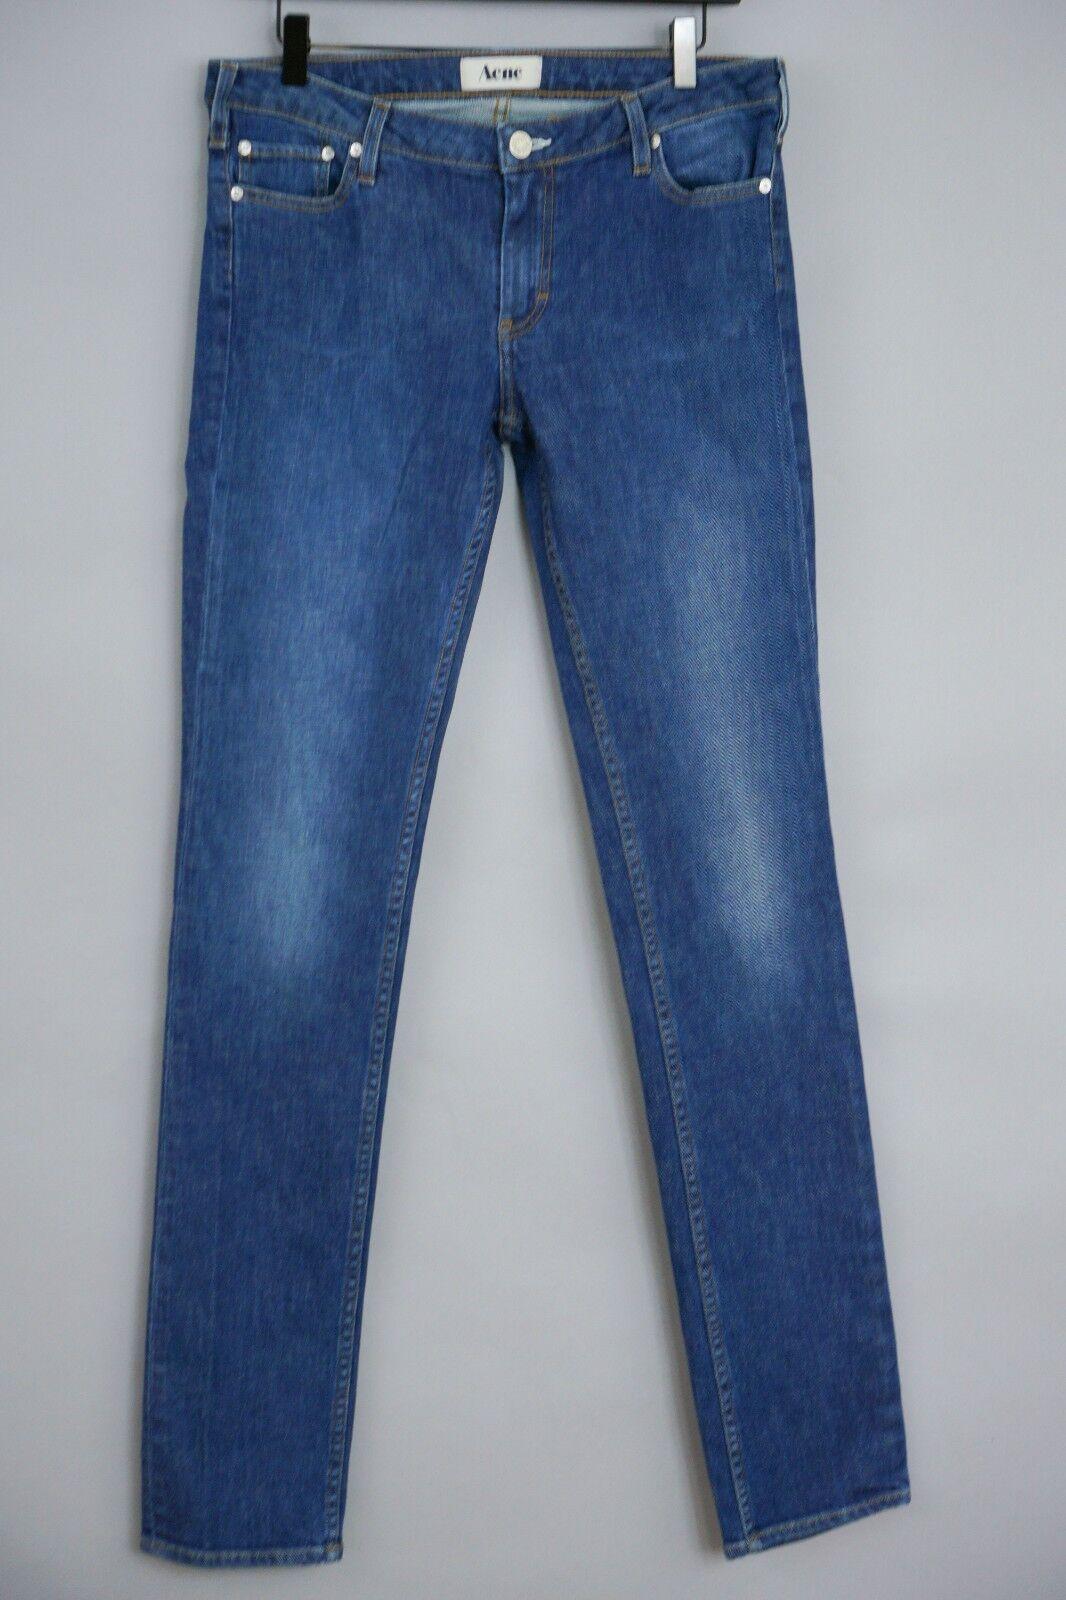 Donna Acne Jeans Kex Blu Mare Slim W32 L34 JFA670